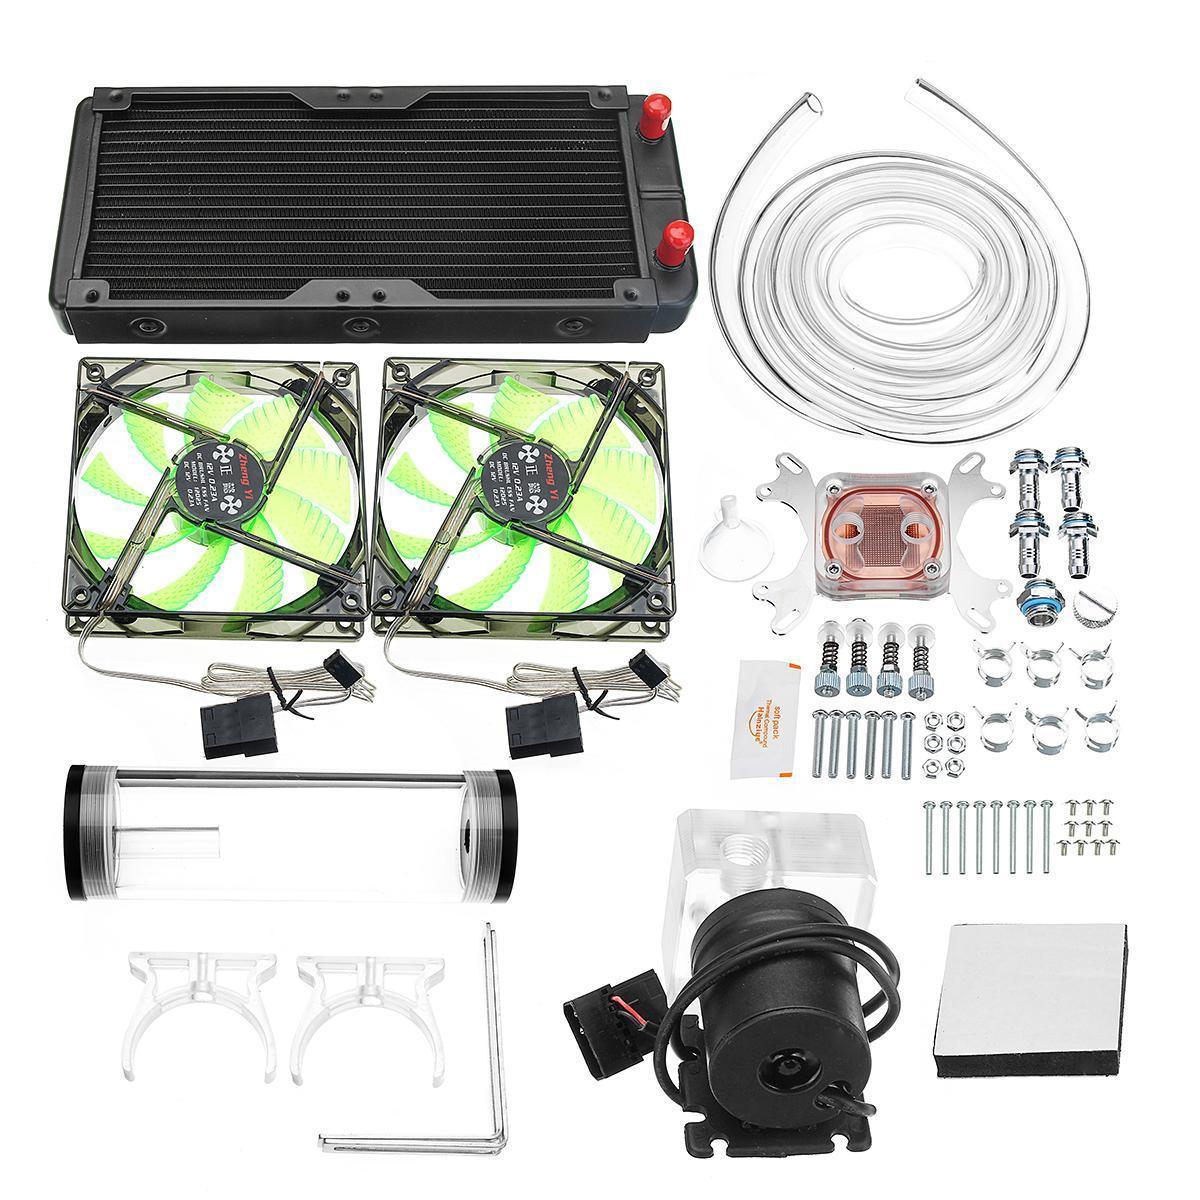 240mm DIY PC Water Cooling Kit CPU GPU Radiato Block Pump Tank Reservoir  Tubing